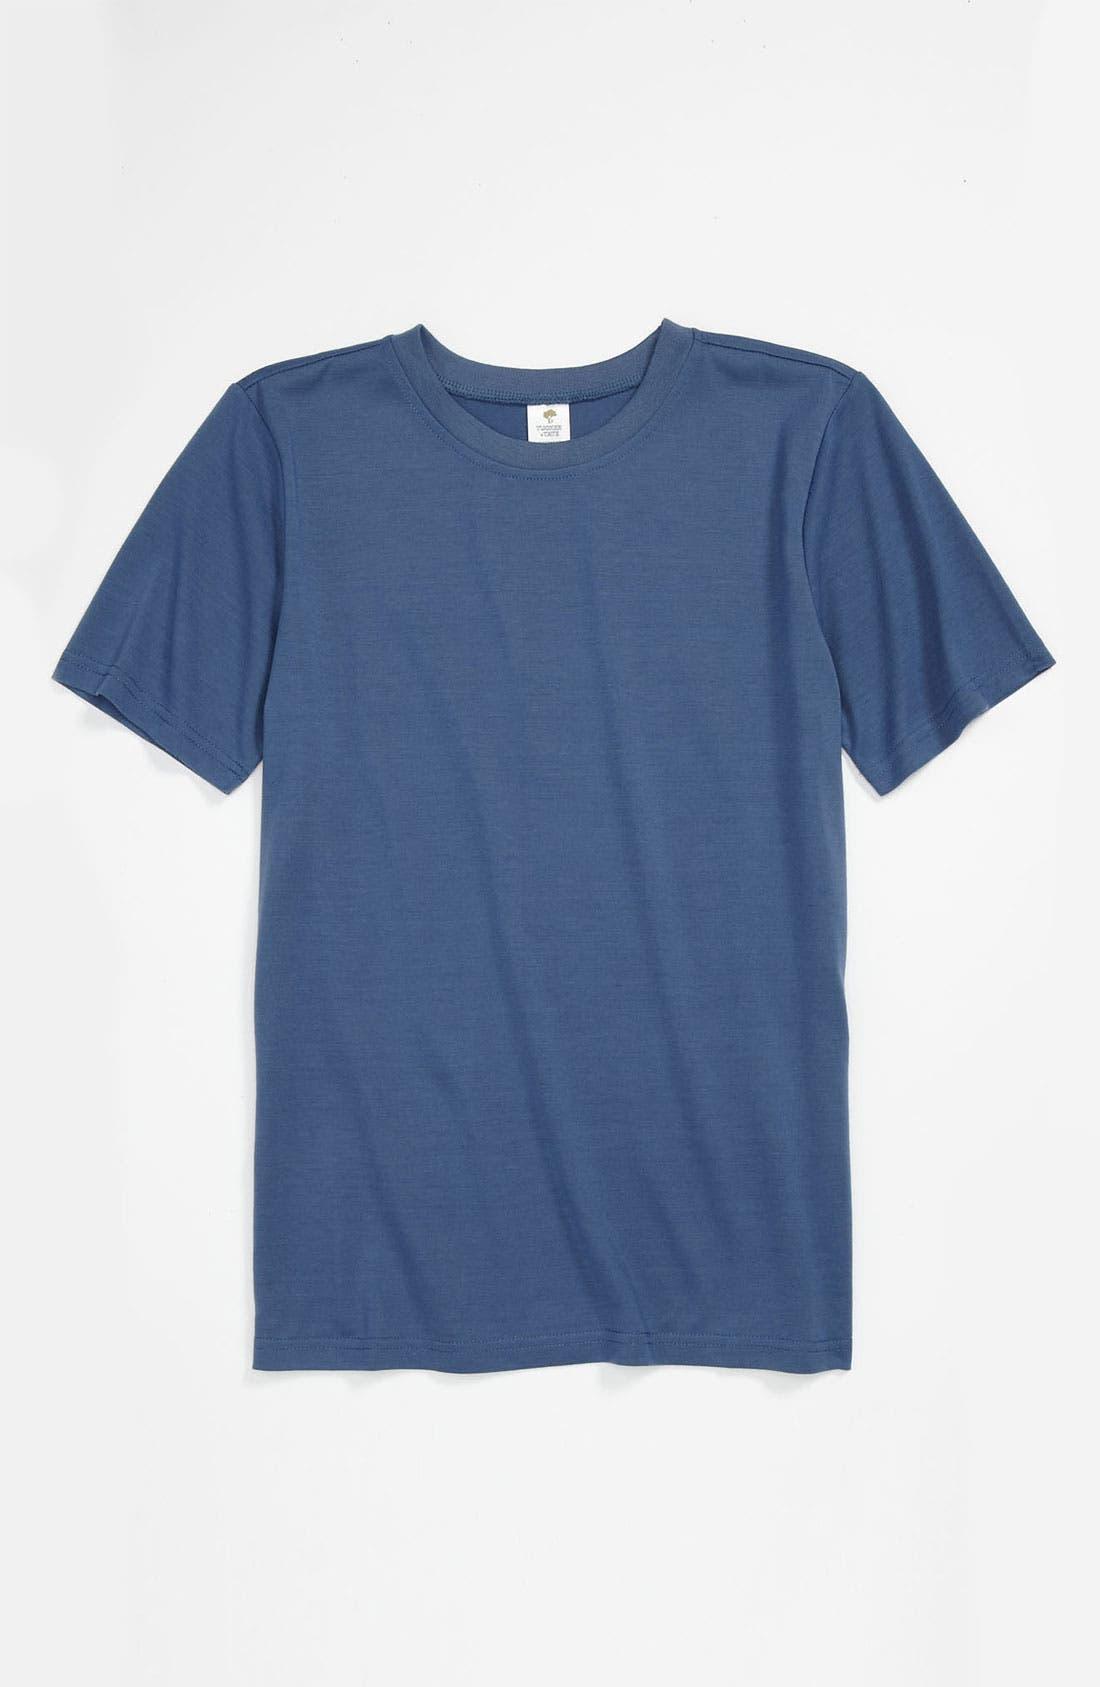 Alternate Image 1 Selected - Tucker + Tate Short Sleeve Pajama Top (Little Boys & Big Boys)